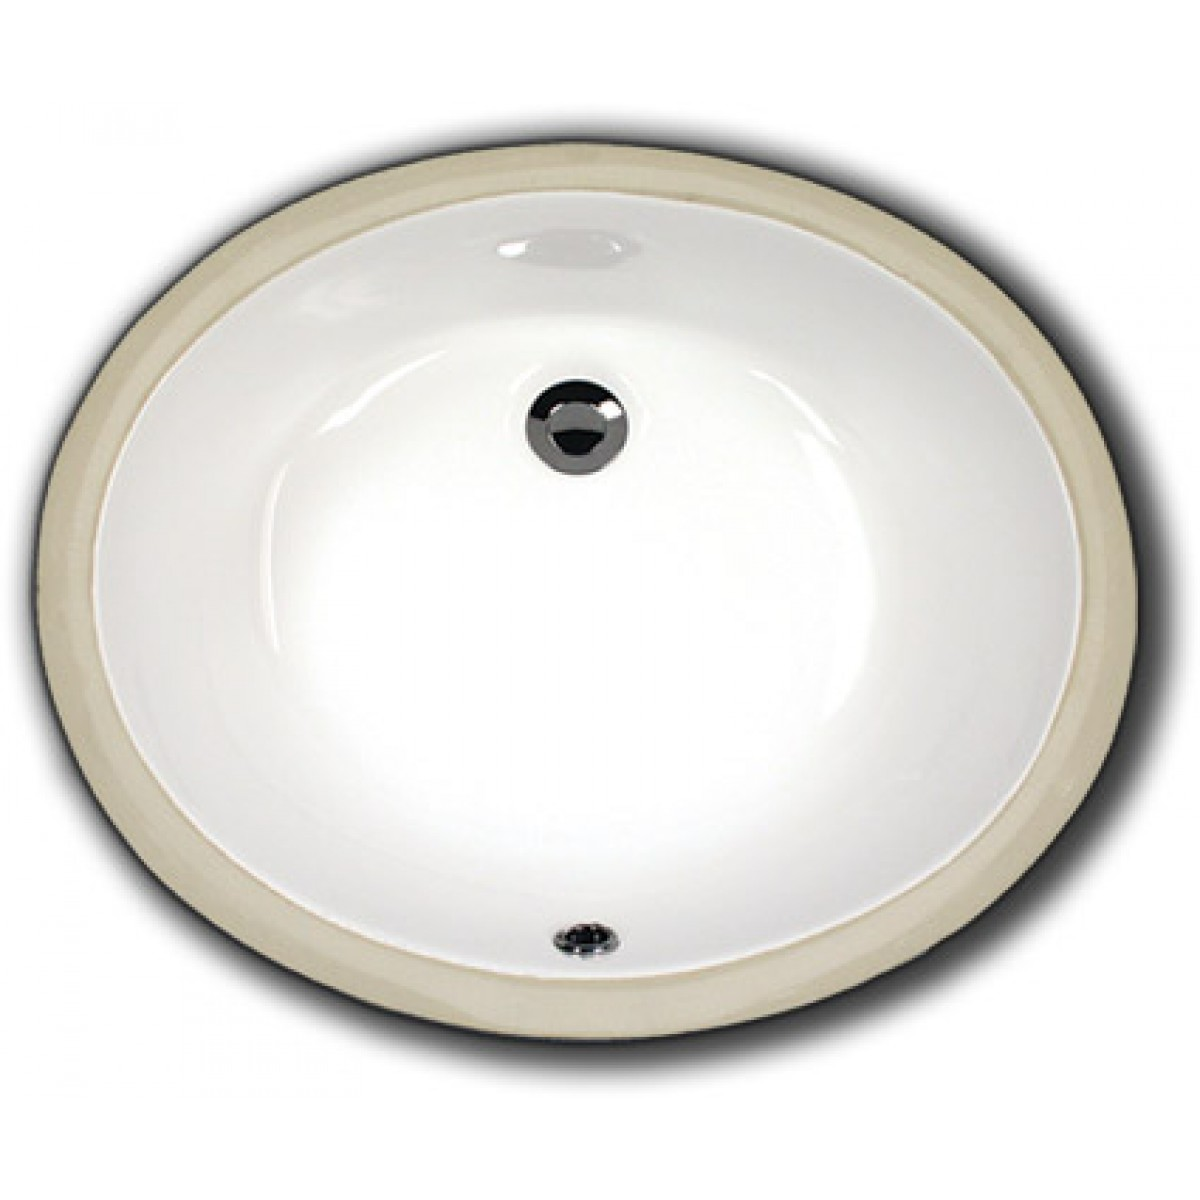 Undermount Bathroom Sink For 18 Inch Vanity biscuit porcelain ceramic vanity undermount bathroom vessel sink